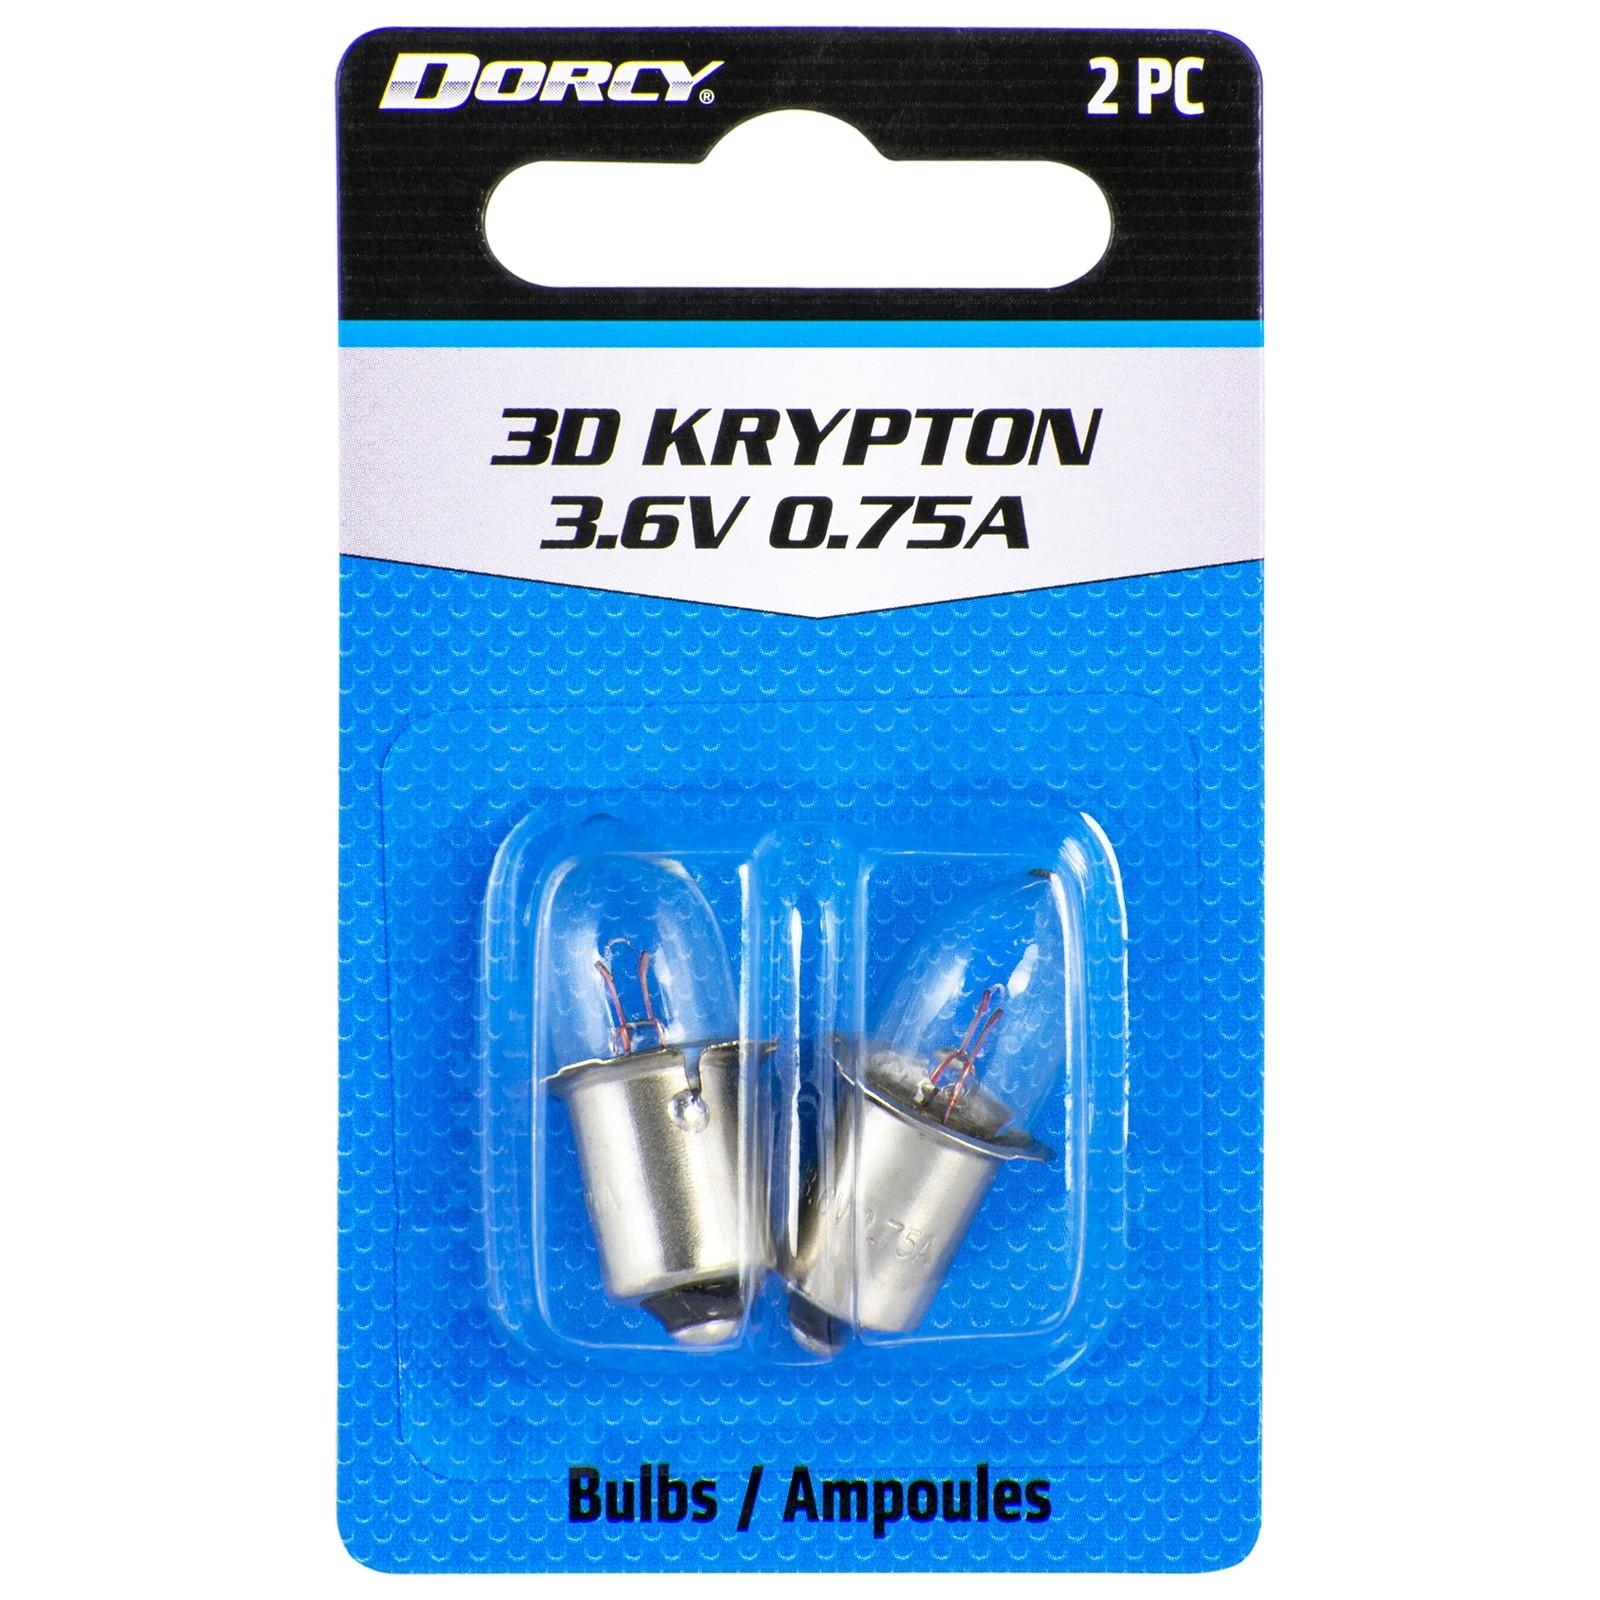 Dorcy 41-1661 3D-3.6-Volt 0.75A Bayonet Base Krypton Replacement Bulb 2-Pack